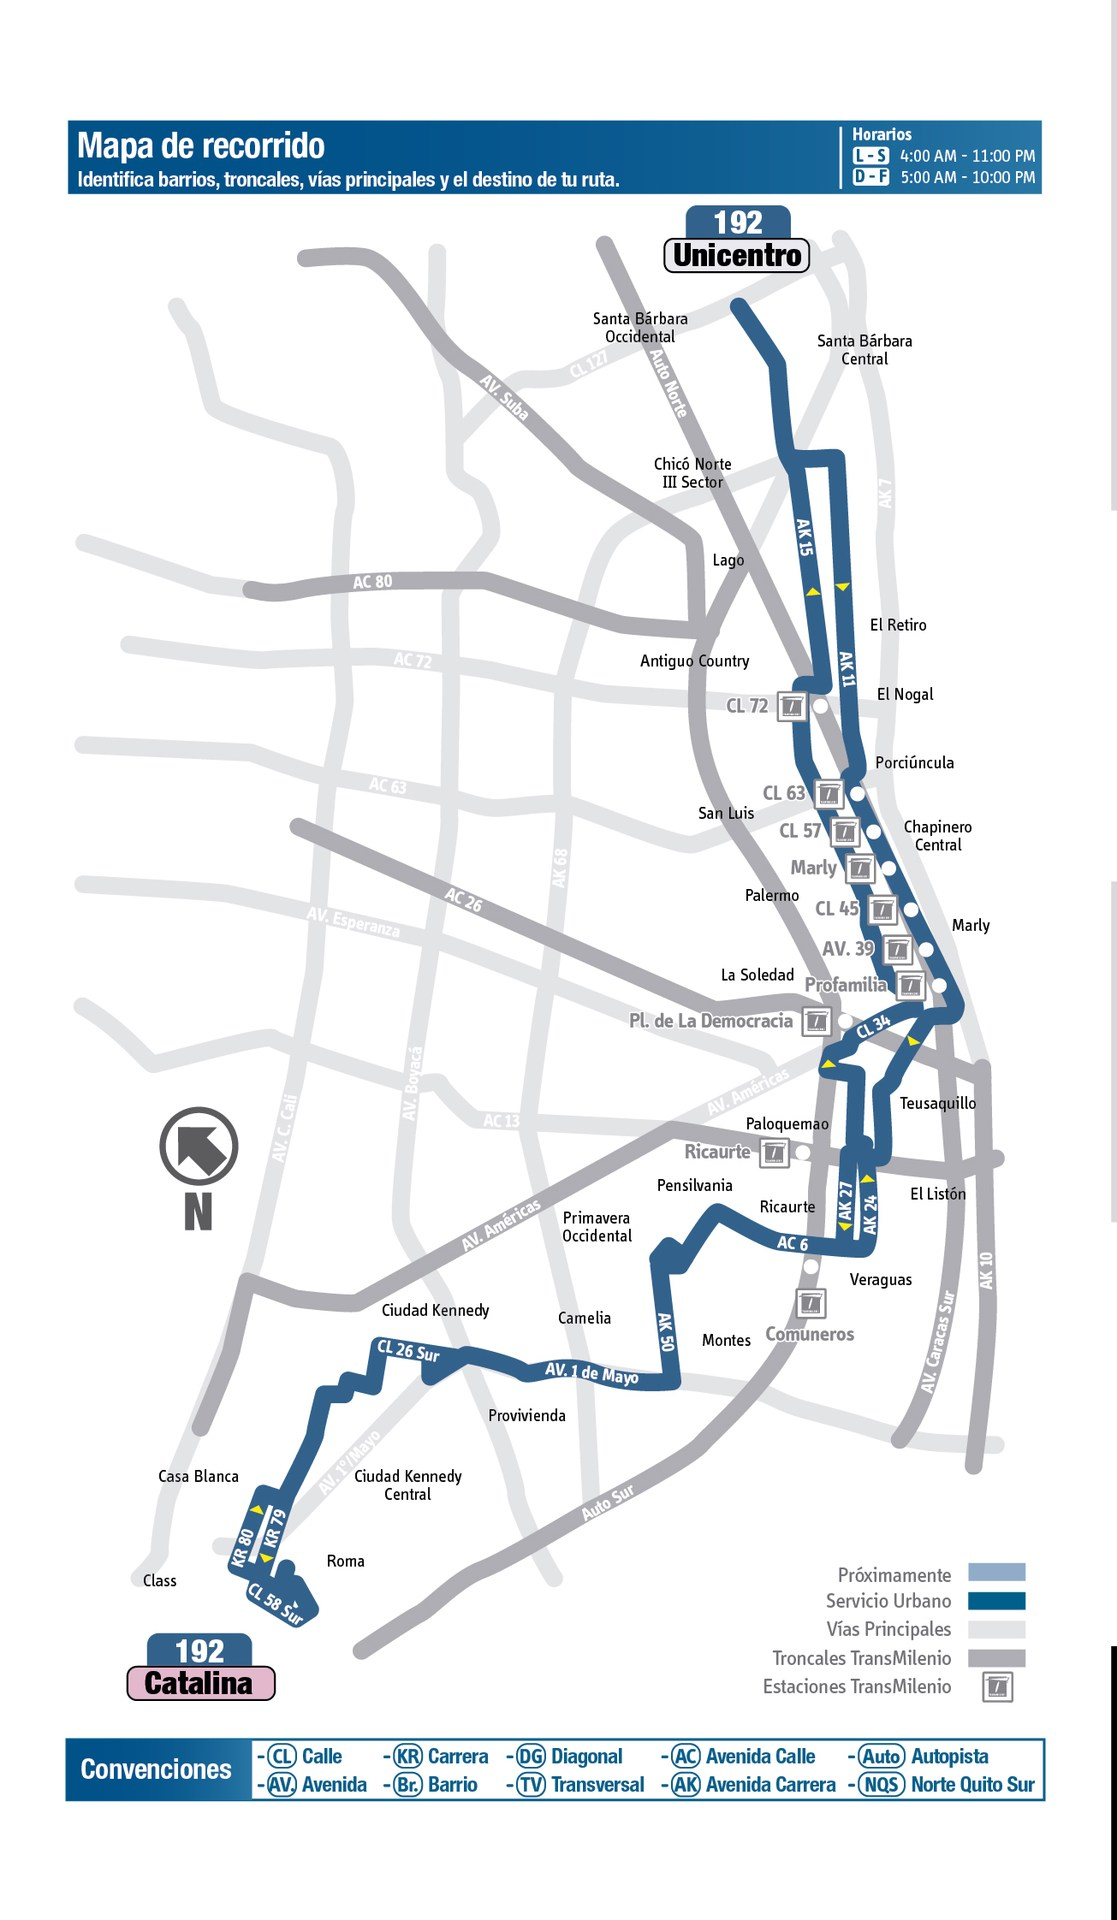 Ruta SITP: 192 Catalina ↔ Unicentro [Urbana] 4